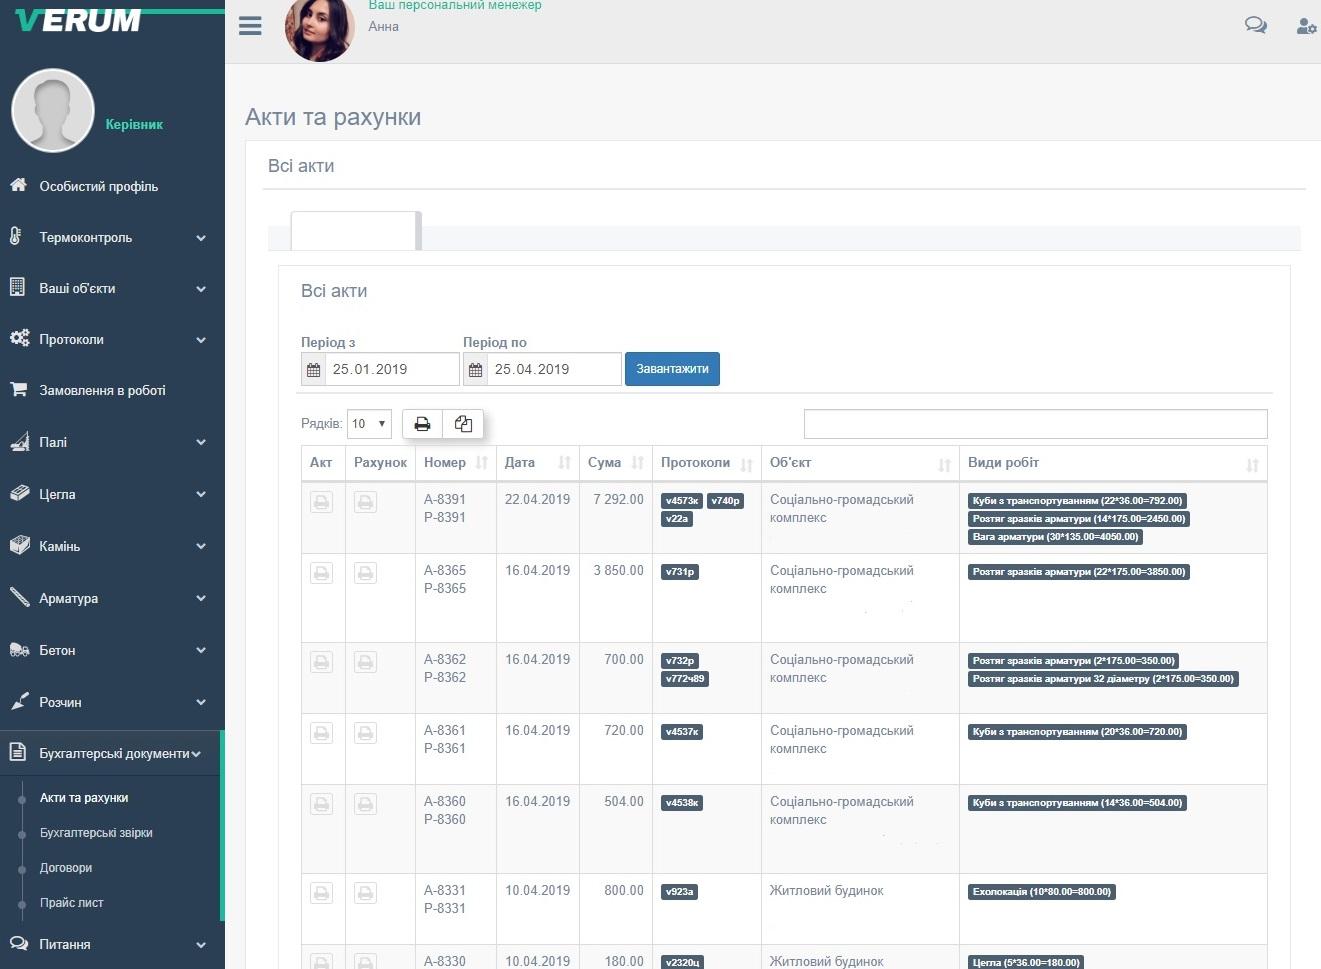 Разработана и внедрена система документооборота в программе Verum